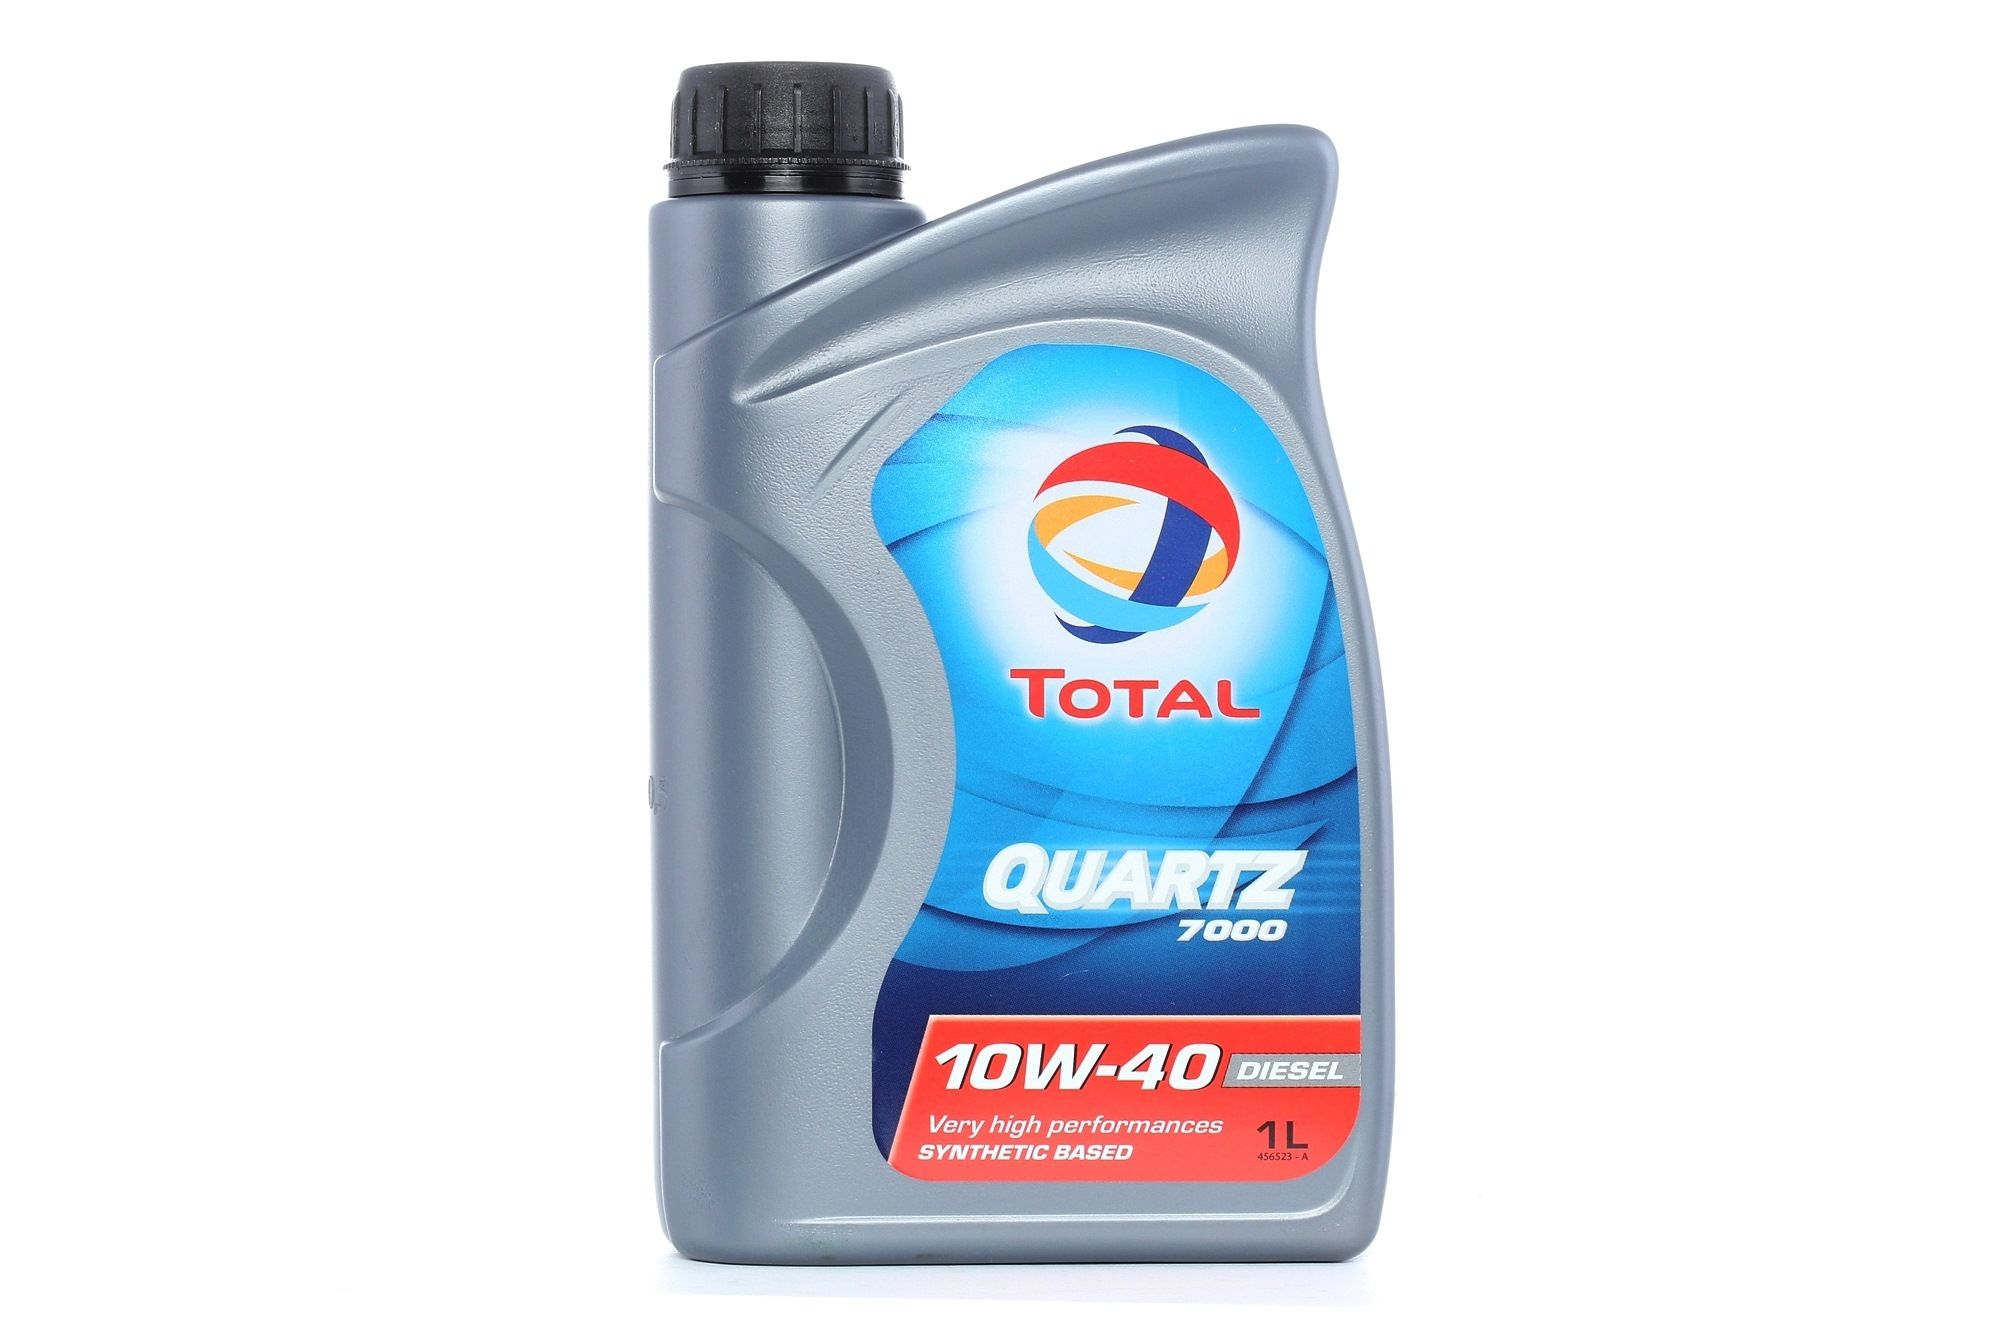 0501CA107C27466841 TOTAL Quartz, 7000 Diesel 10W-40, 1l, Teilsynthetiköl Motoröl 2201534 günstig kaufen